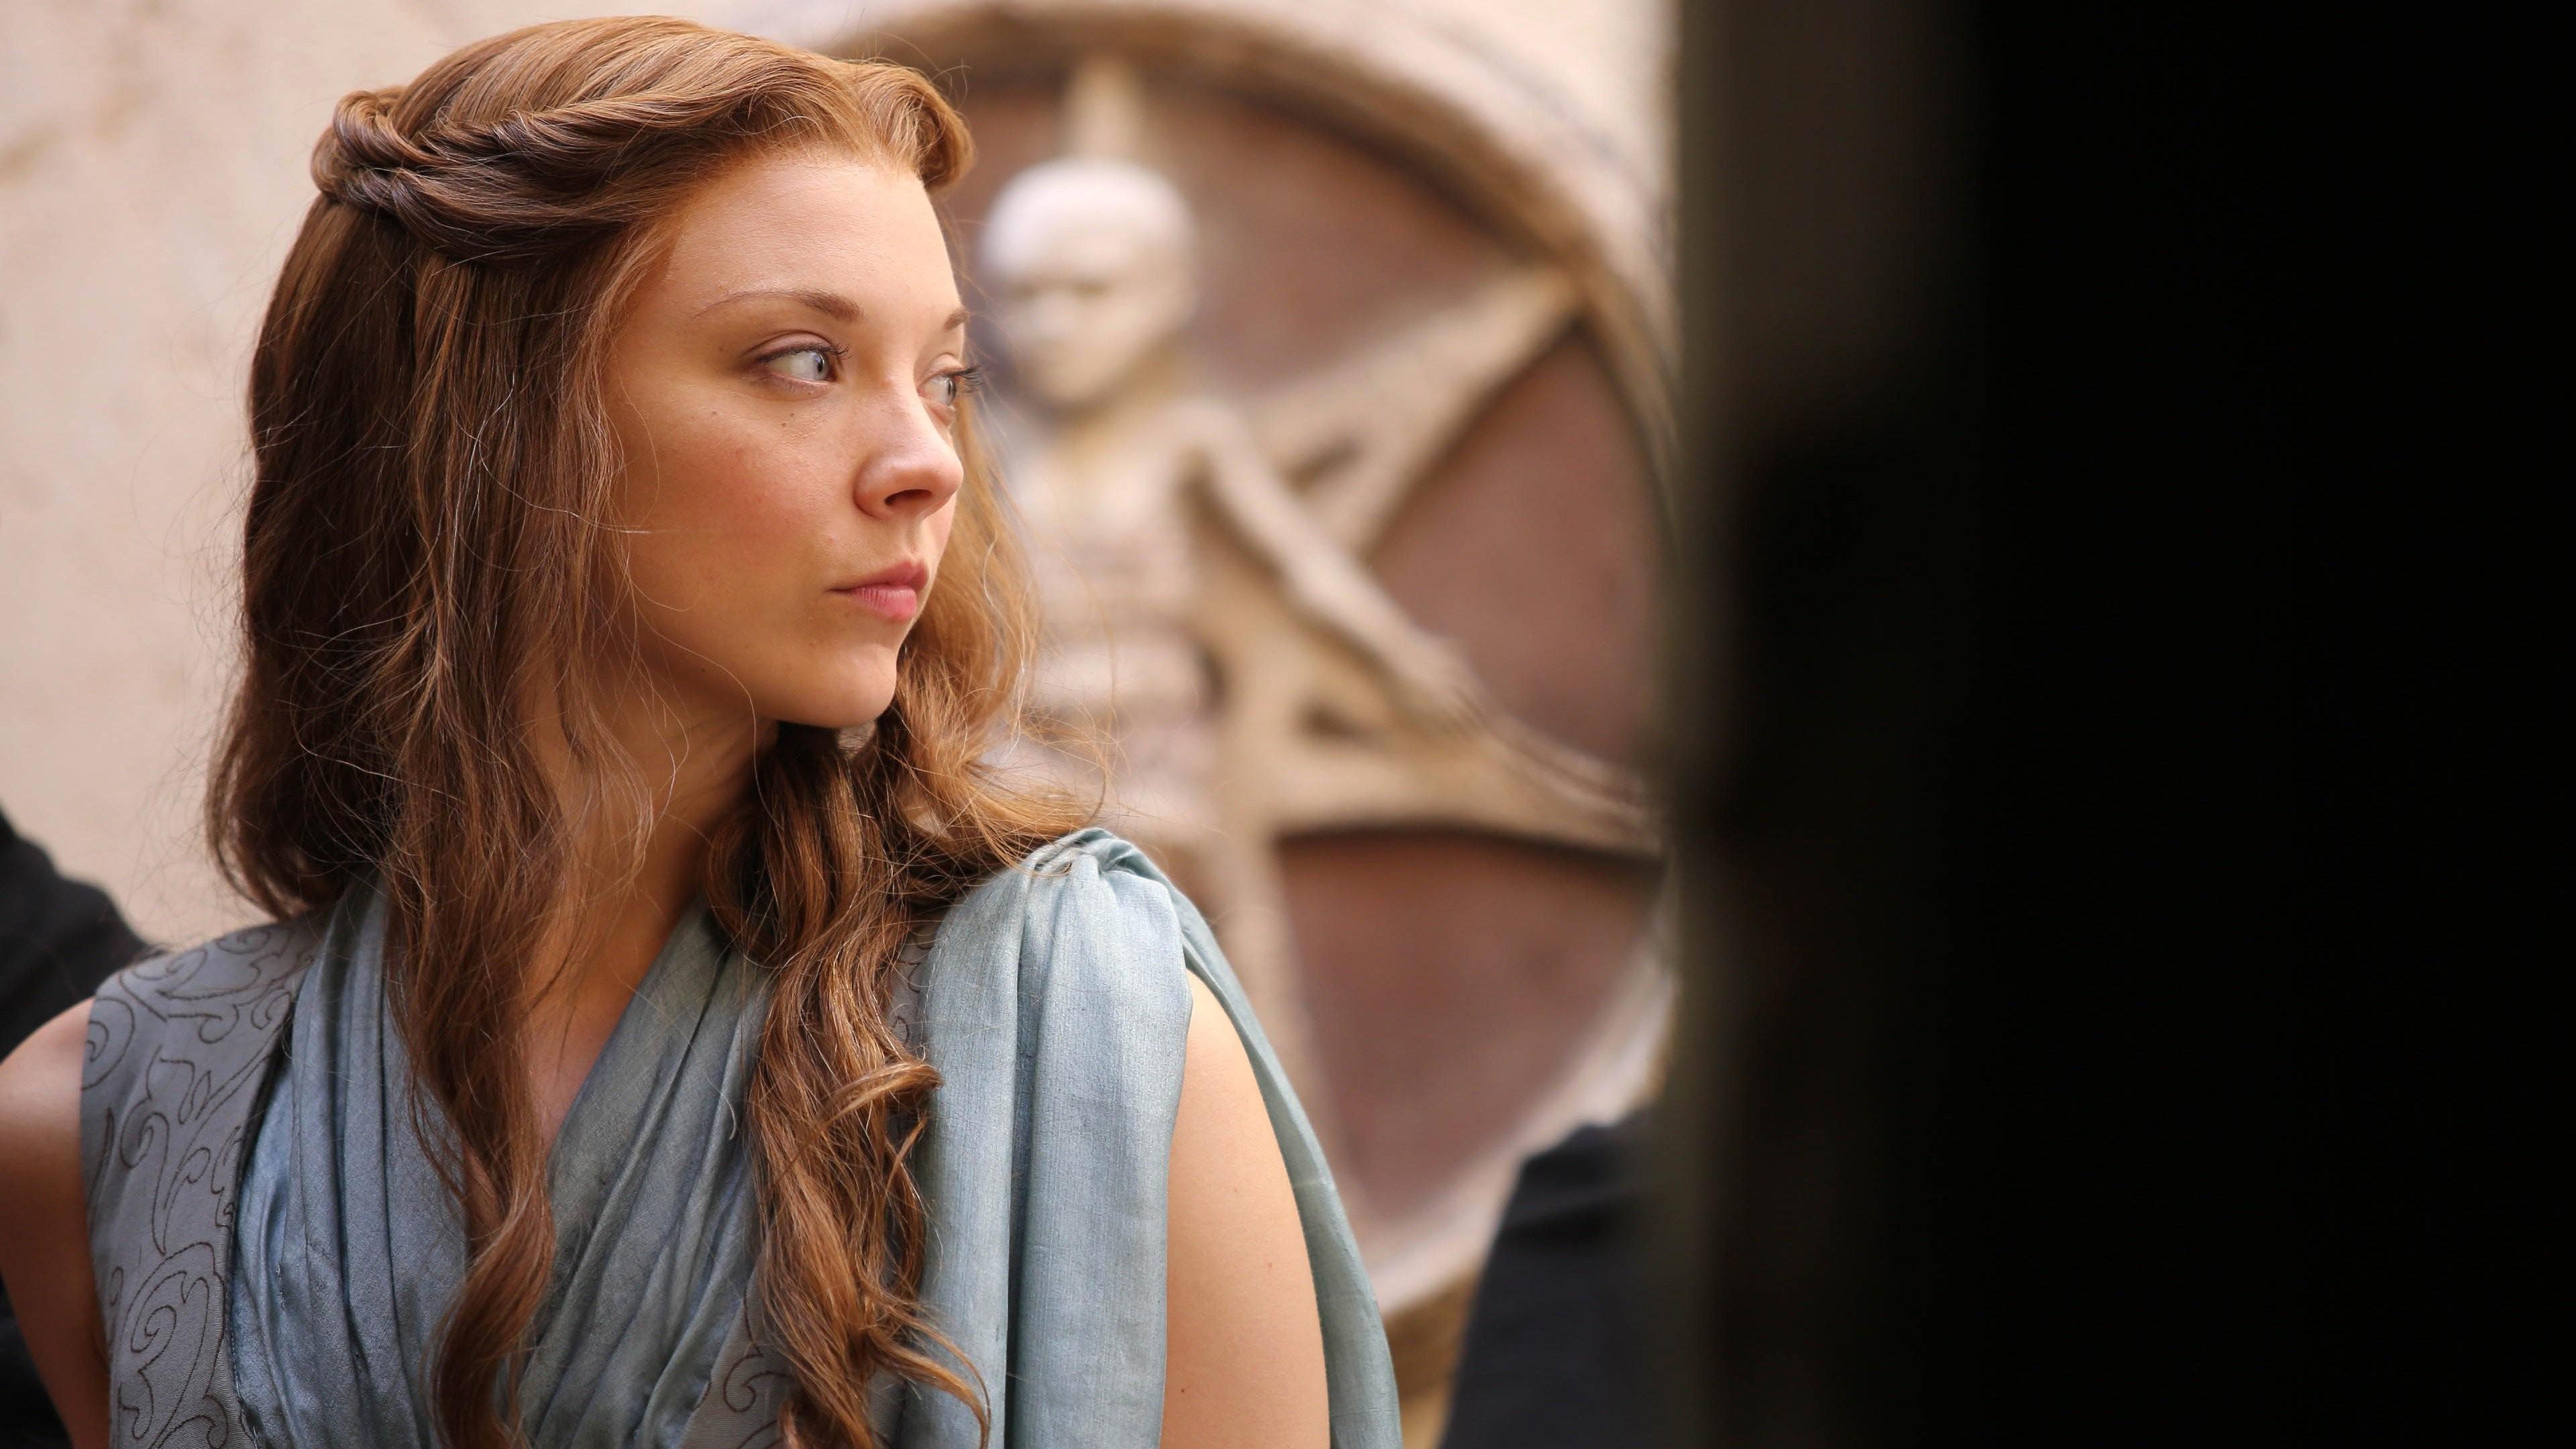 2016 Natalie Dormer Game Of Thrones 2048×1152 Resolution